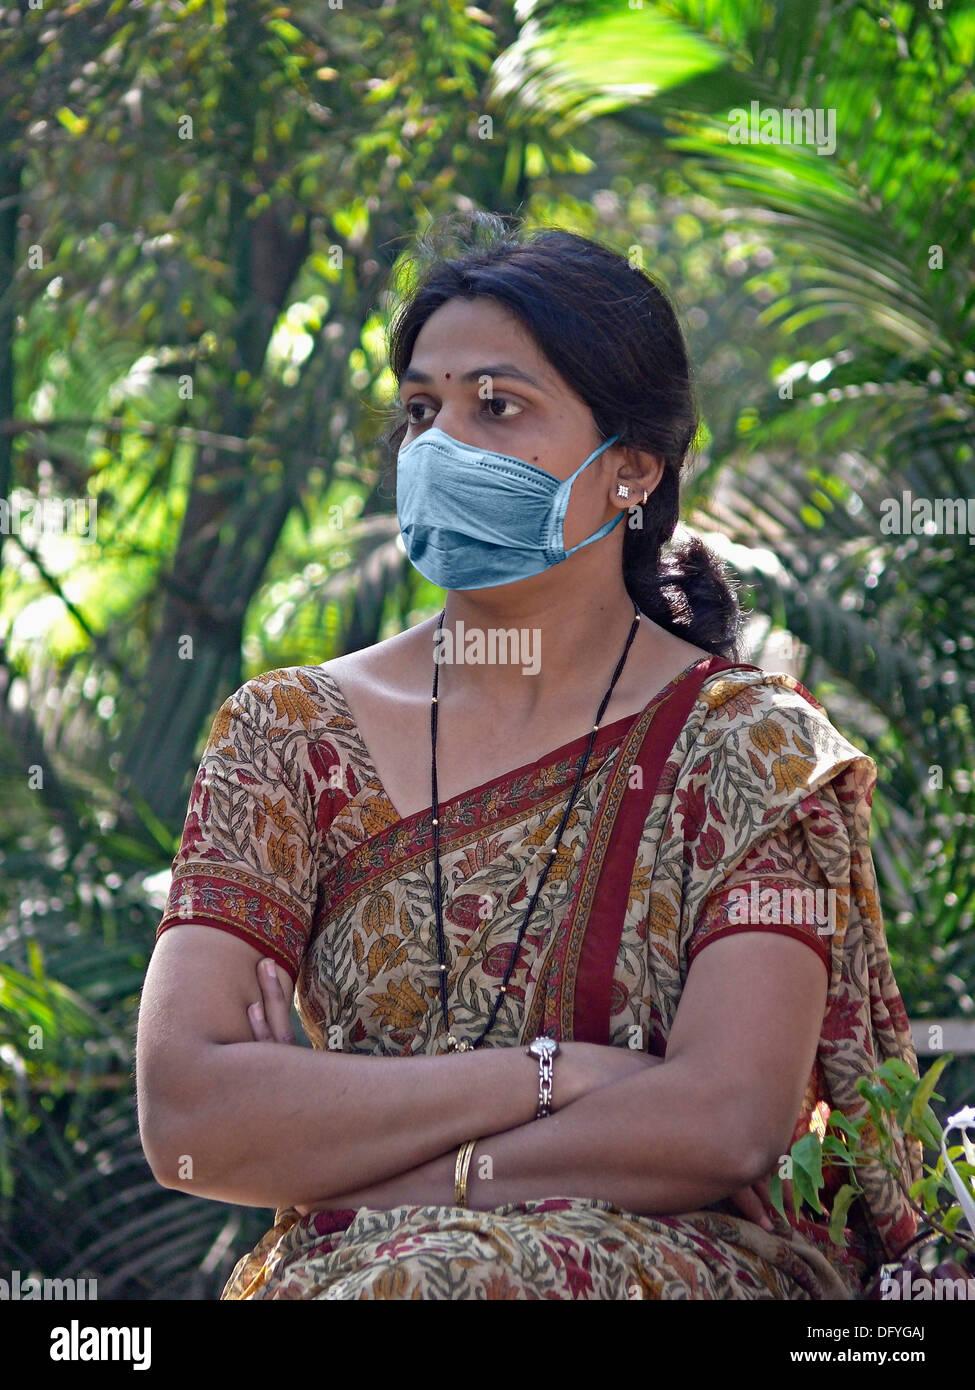 Woman, Precaution mask for Swine Flu, H1N1 - Stock Image